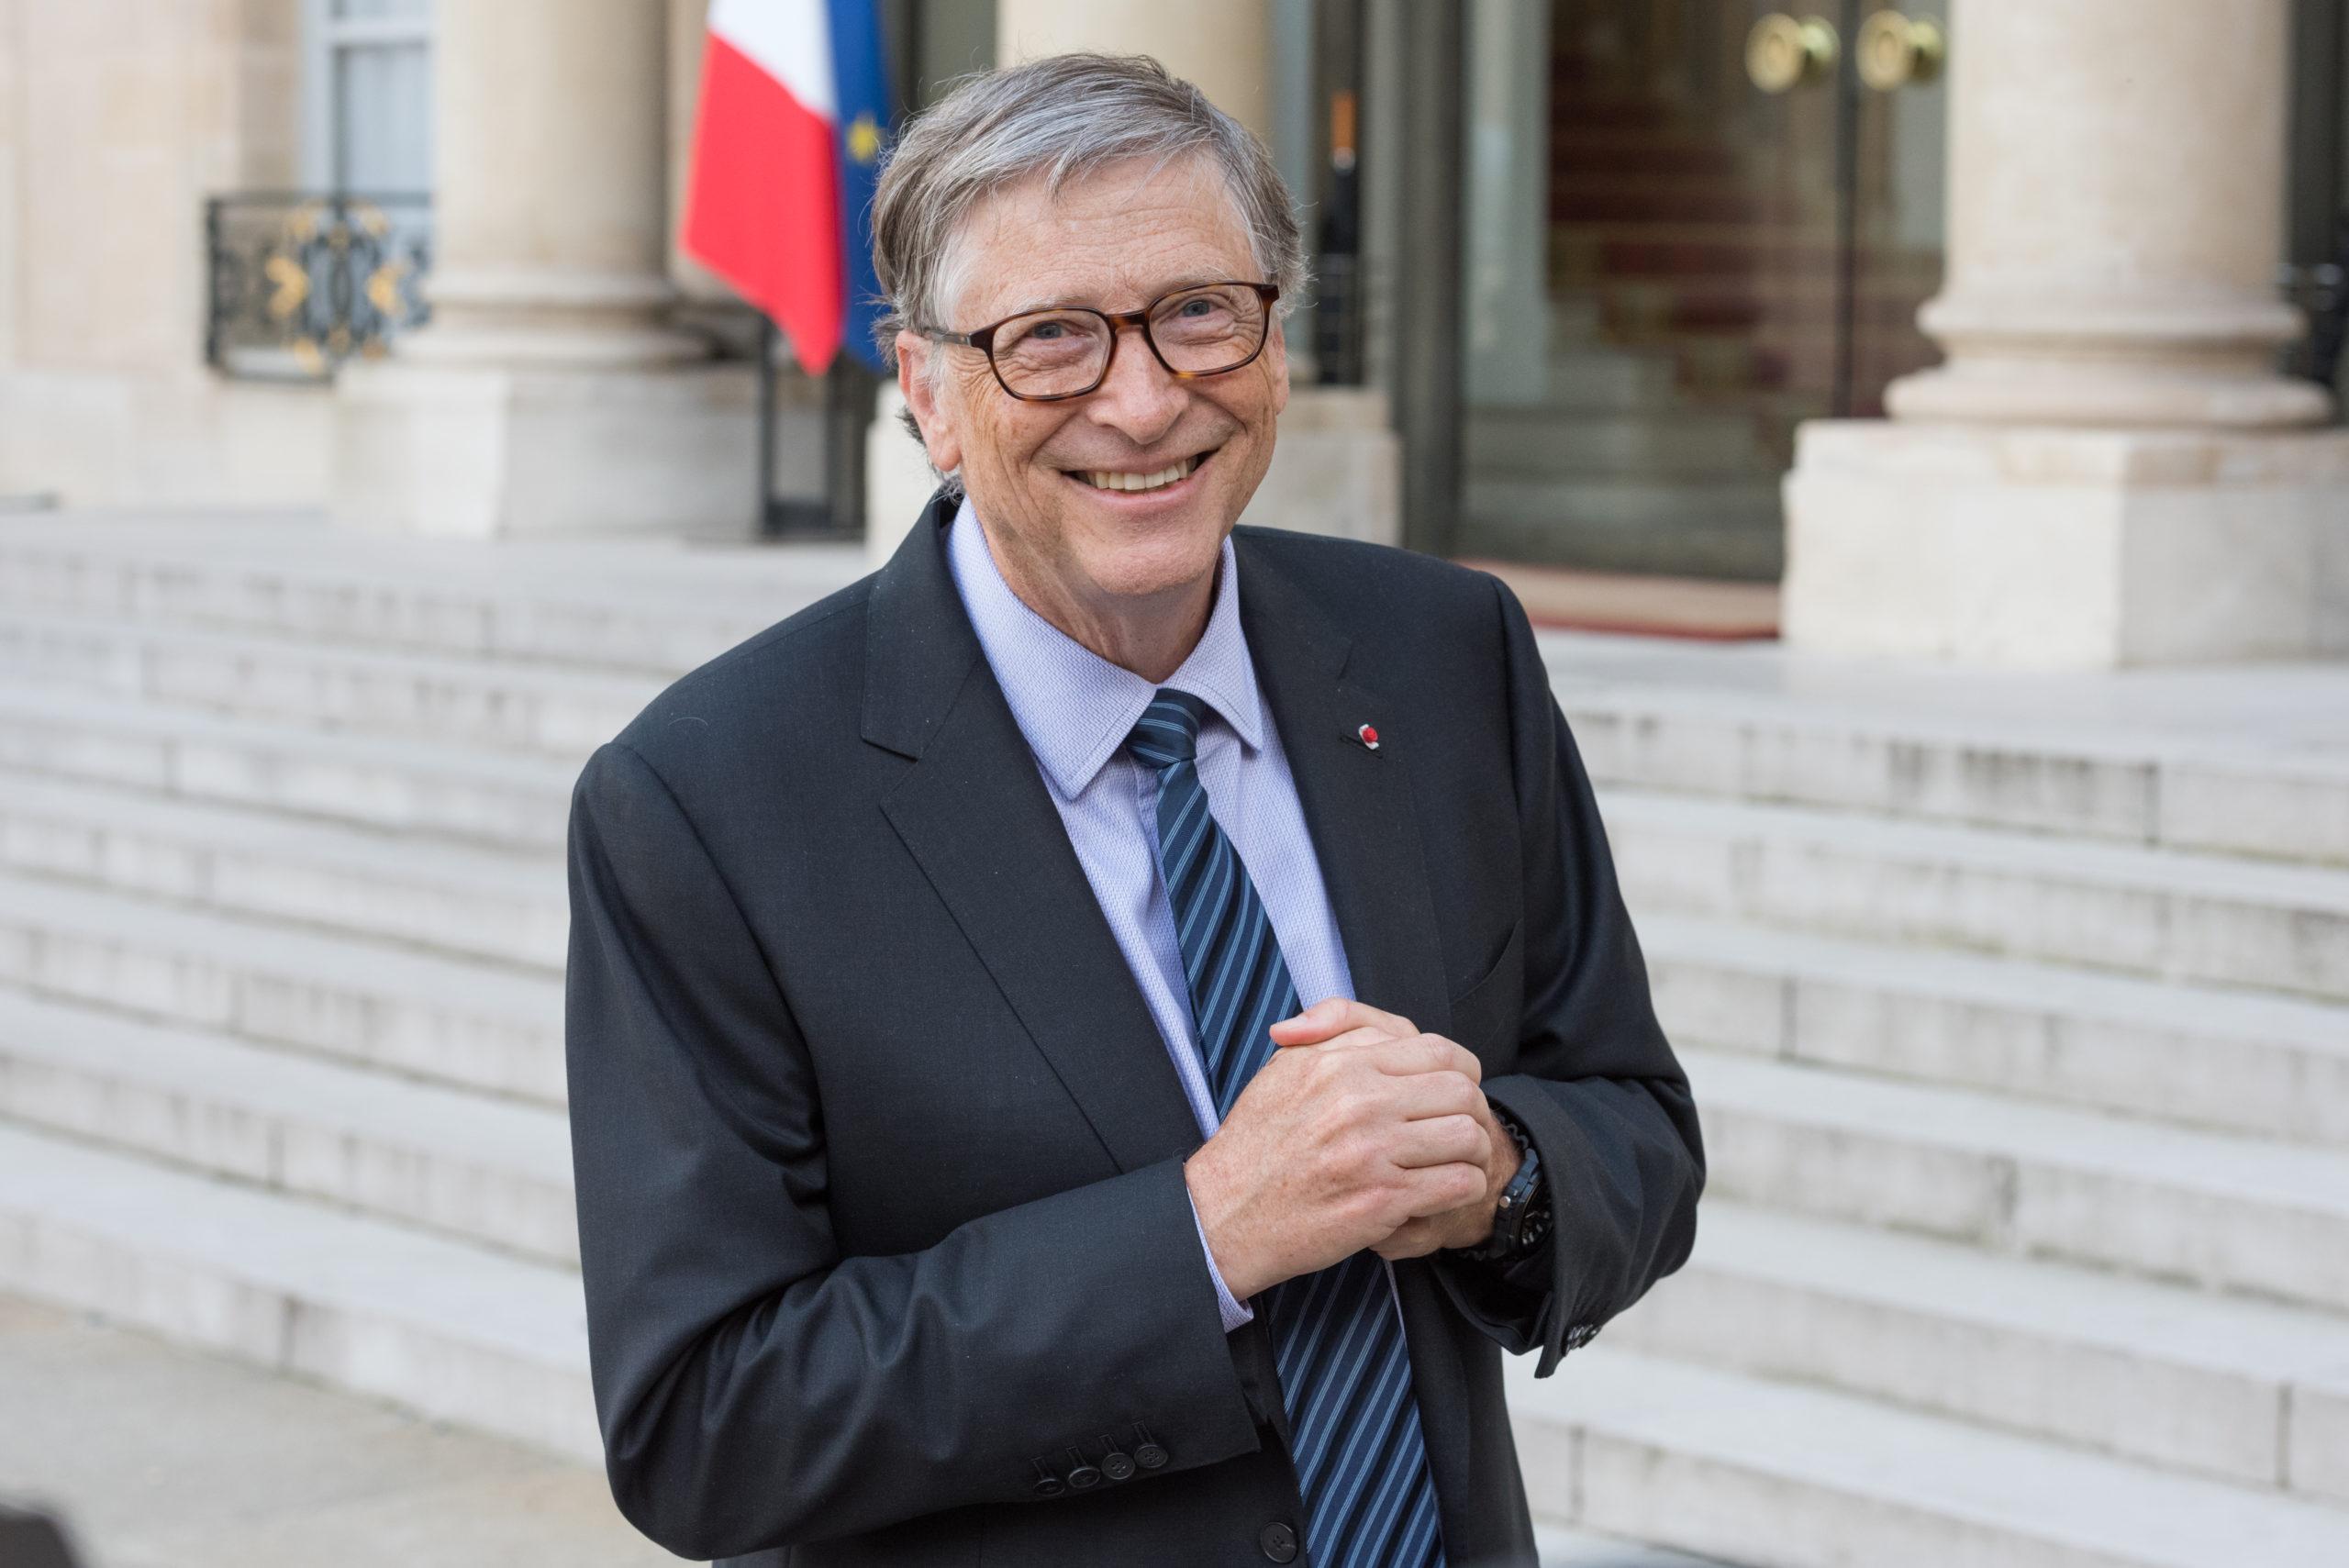 Viral TikTok Shows Bill Gates Watching Himself Get Roasted By Chris Rock